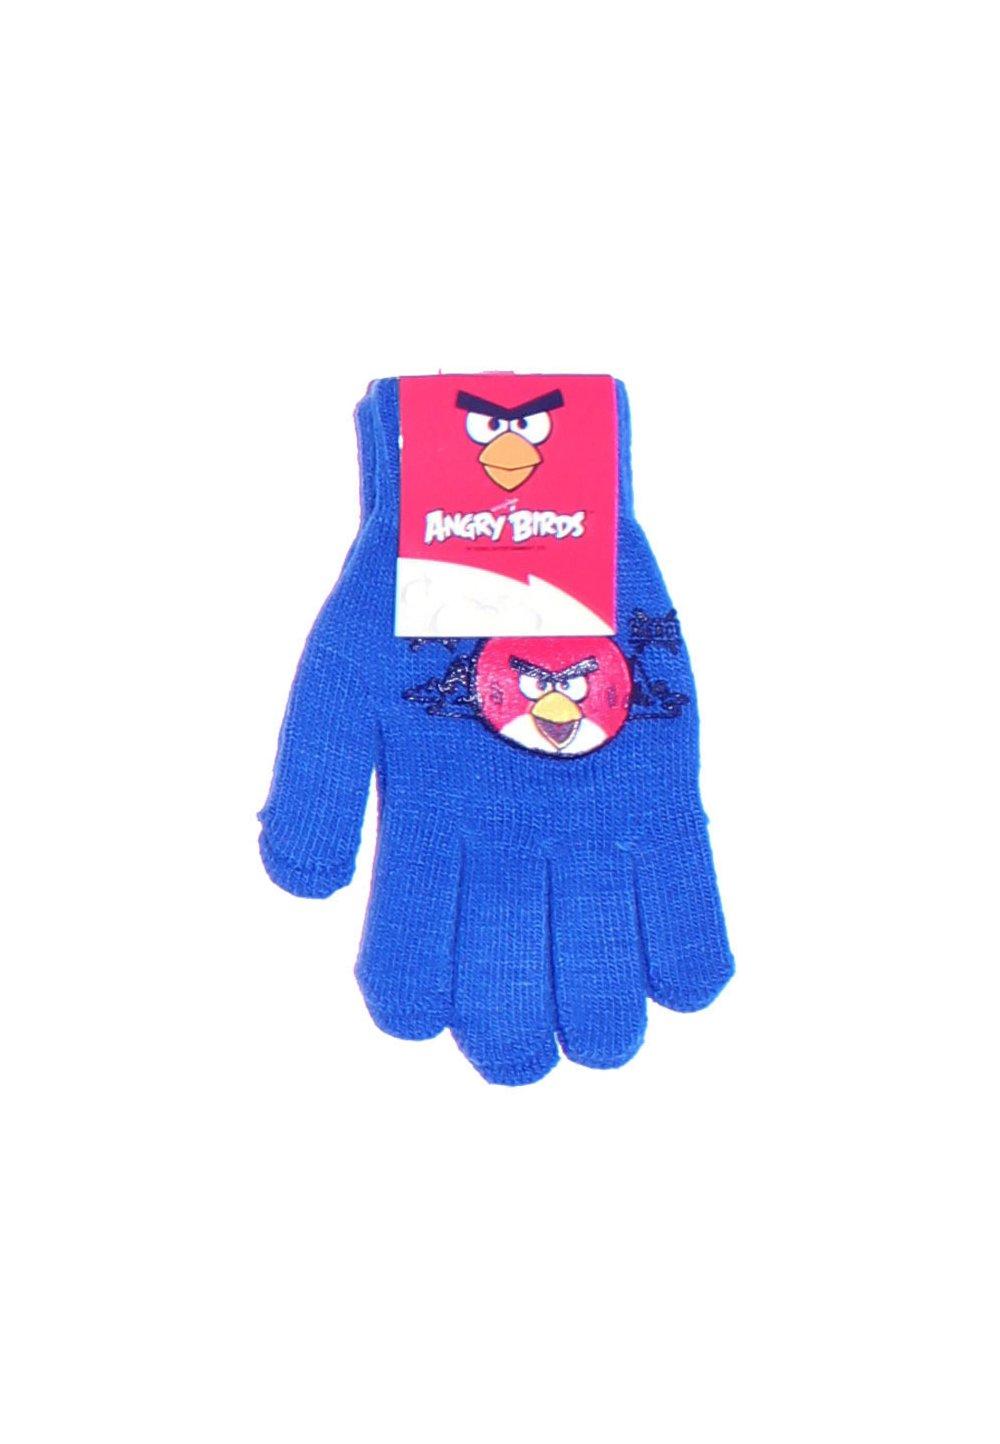 Manusi cu degete, Angry Birds, 3-7ani, albastru imagine